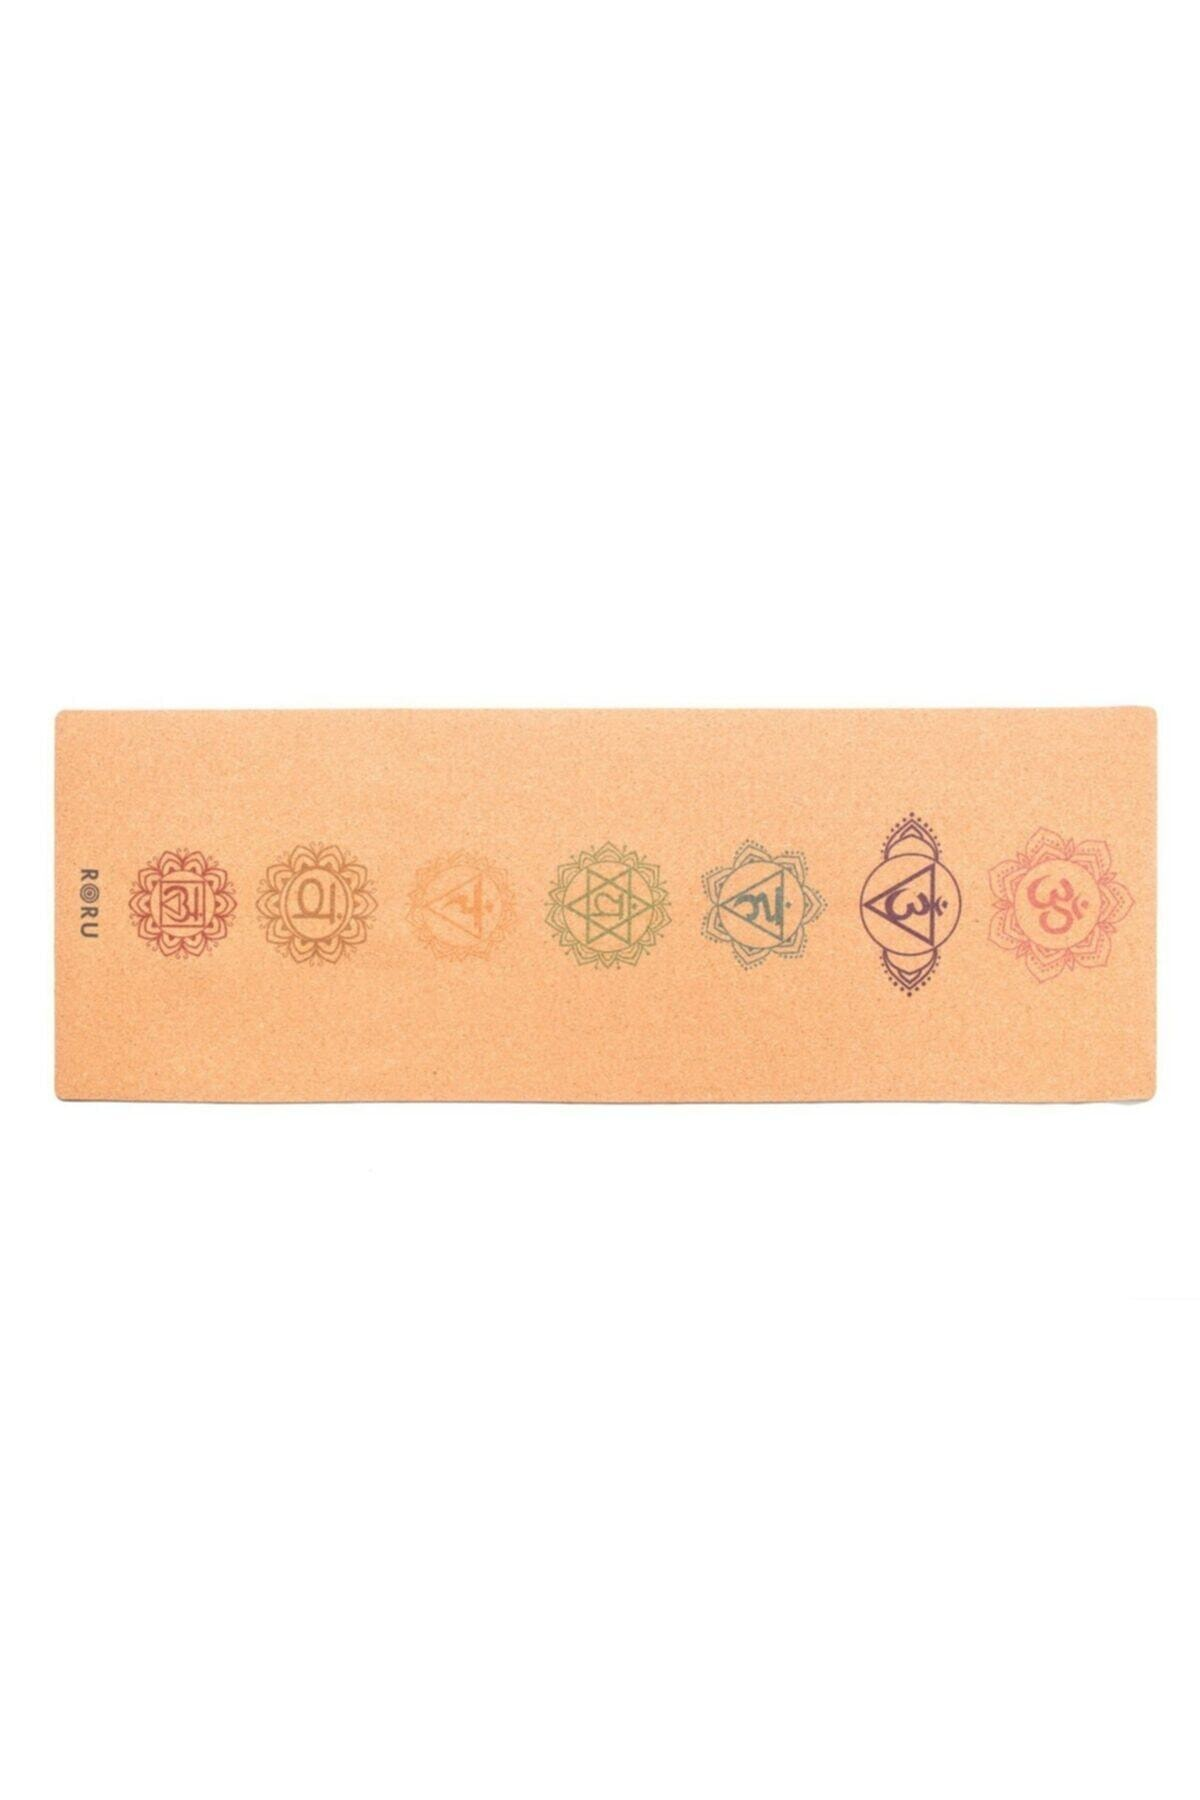 Roru Concept Çakra Desenli Mantar Yoga Matı